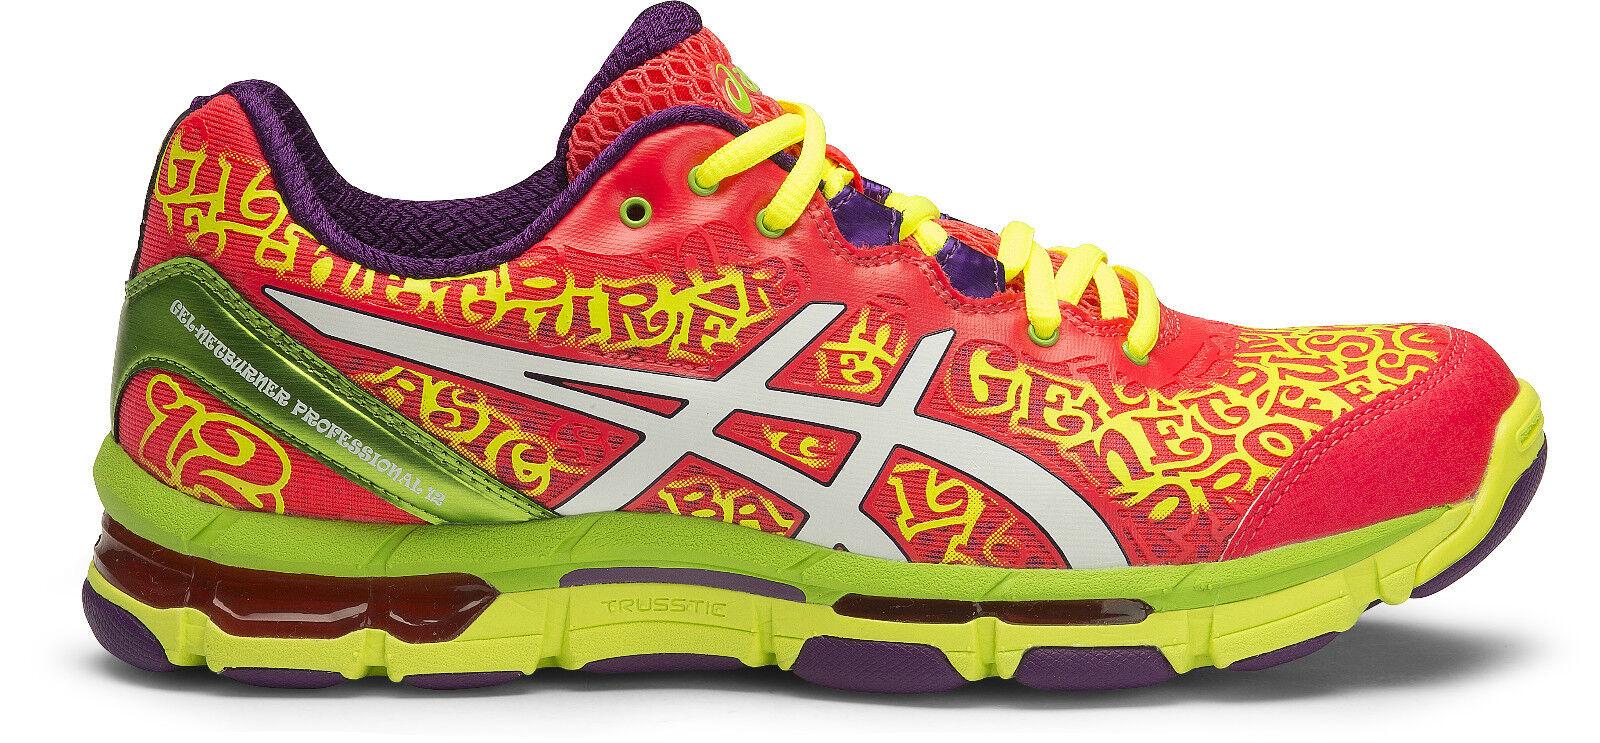 * NEW * Asics Gel Netburner Professional 12 Womens Netball Shoe (B) (2001)